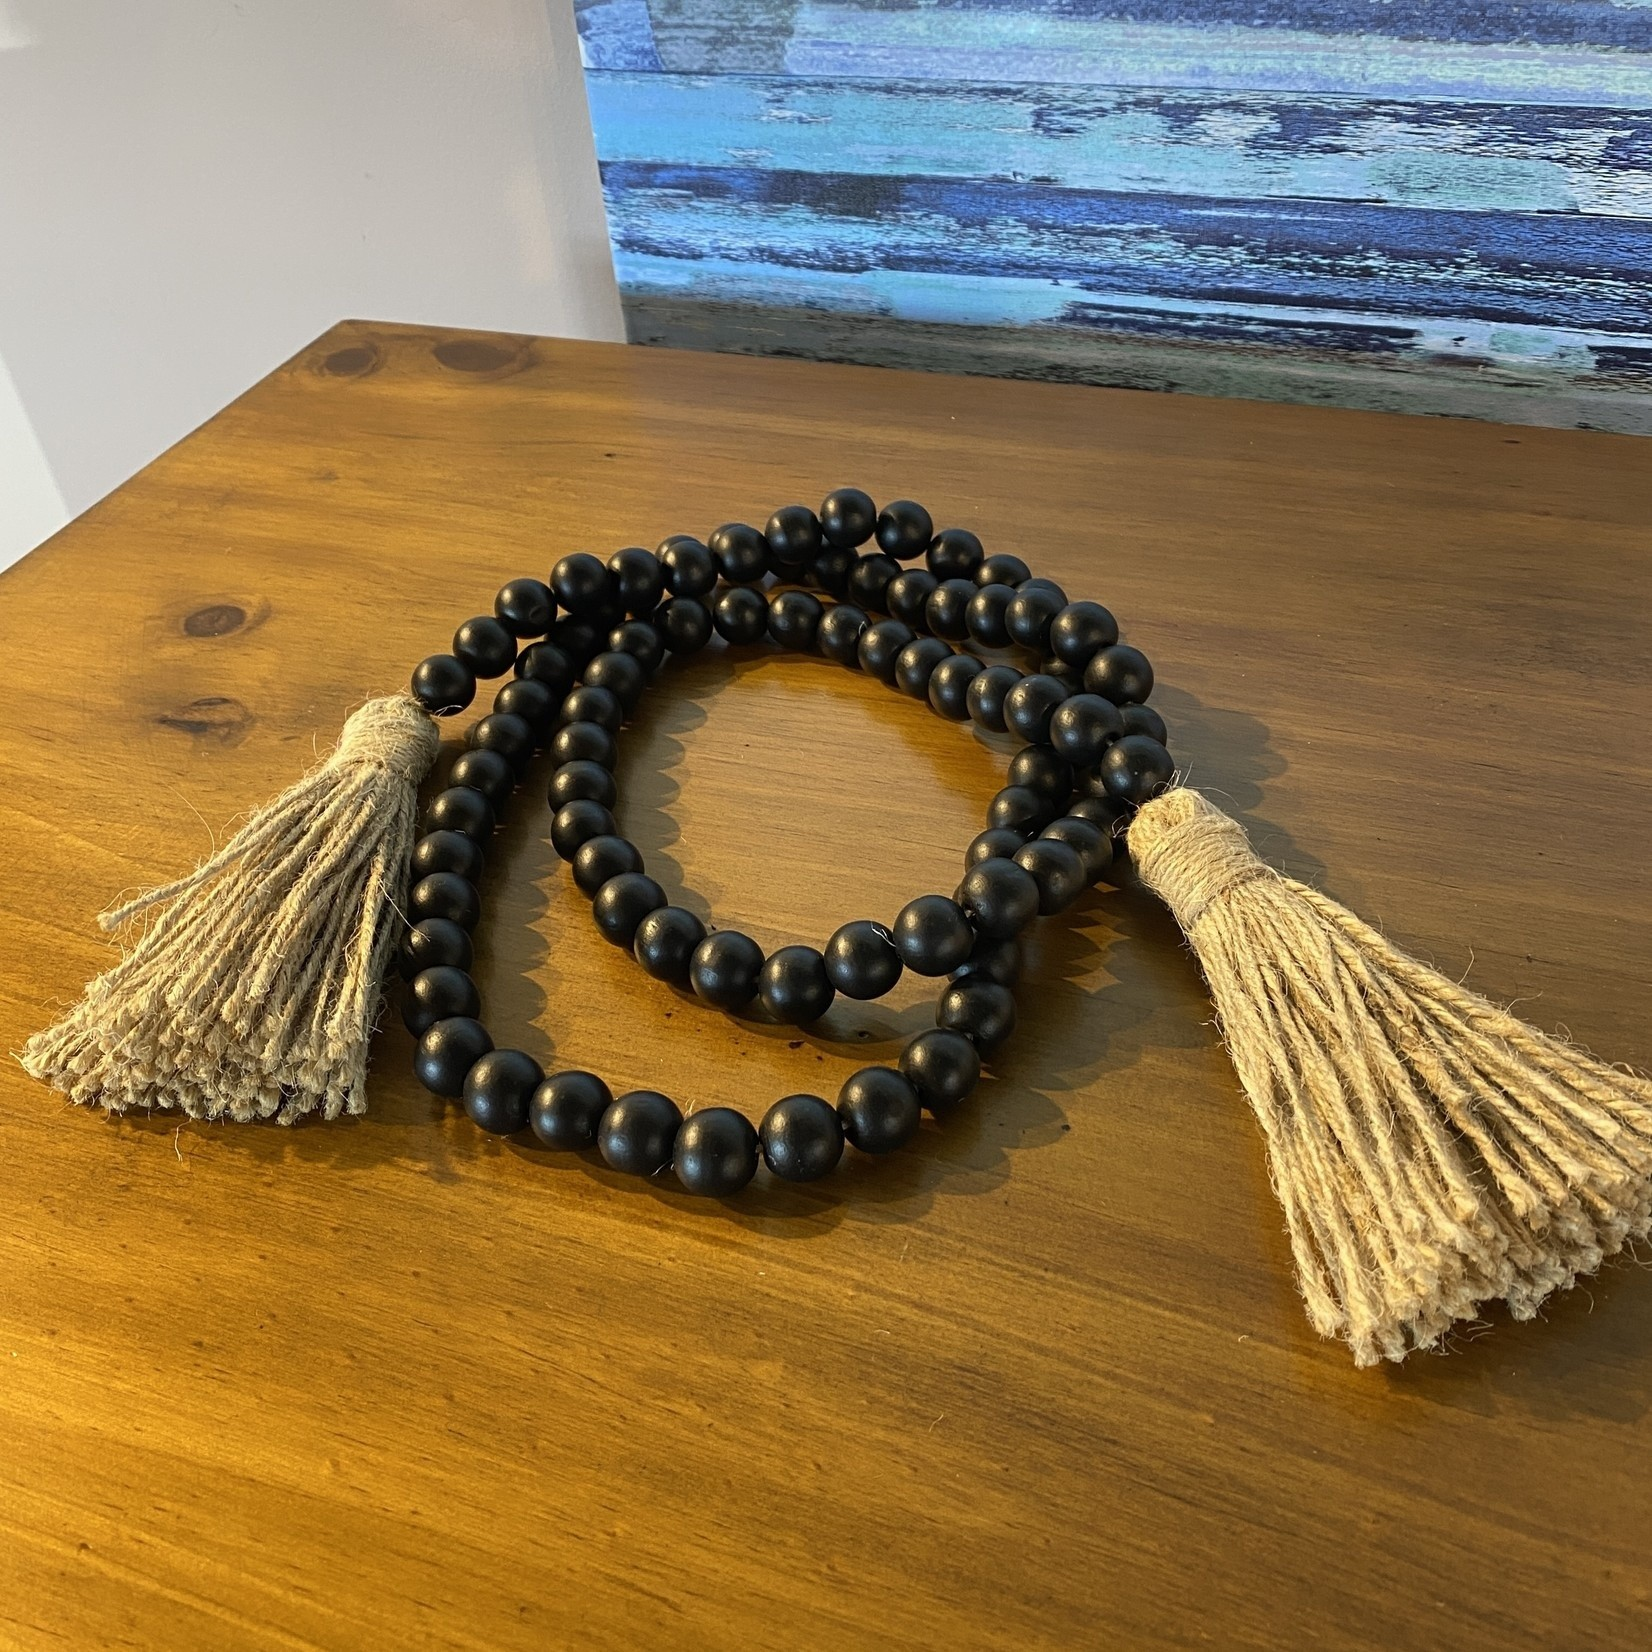 Wood Bead Decor - Black